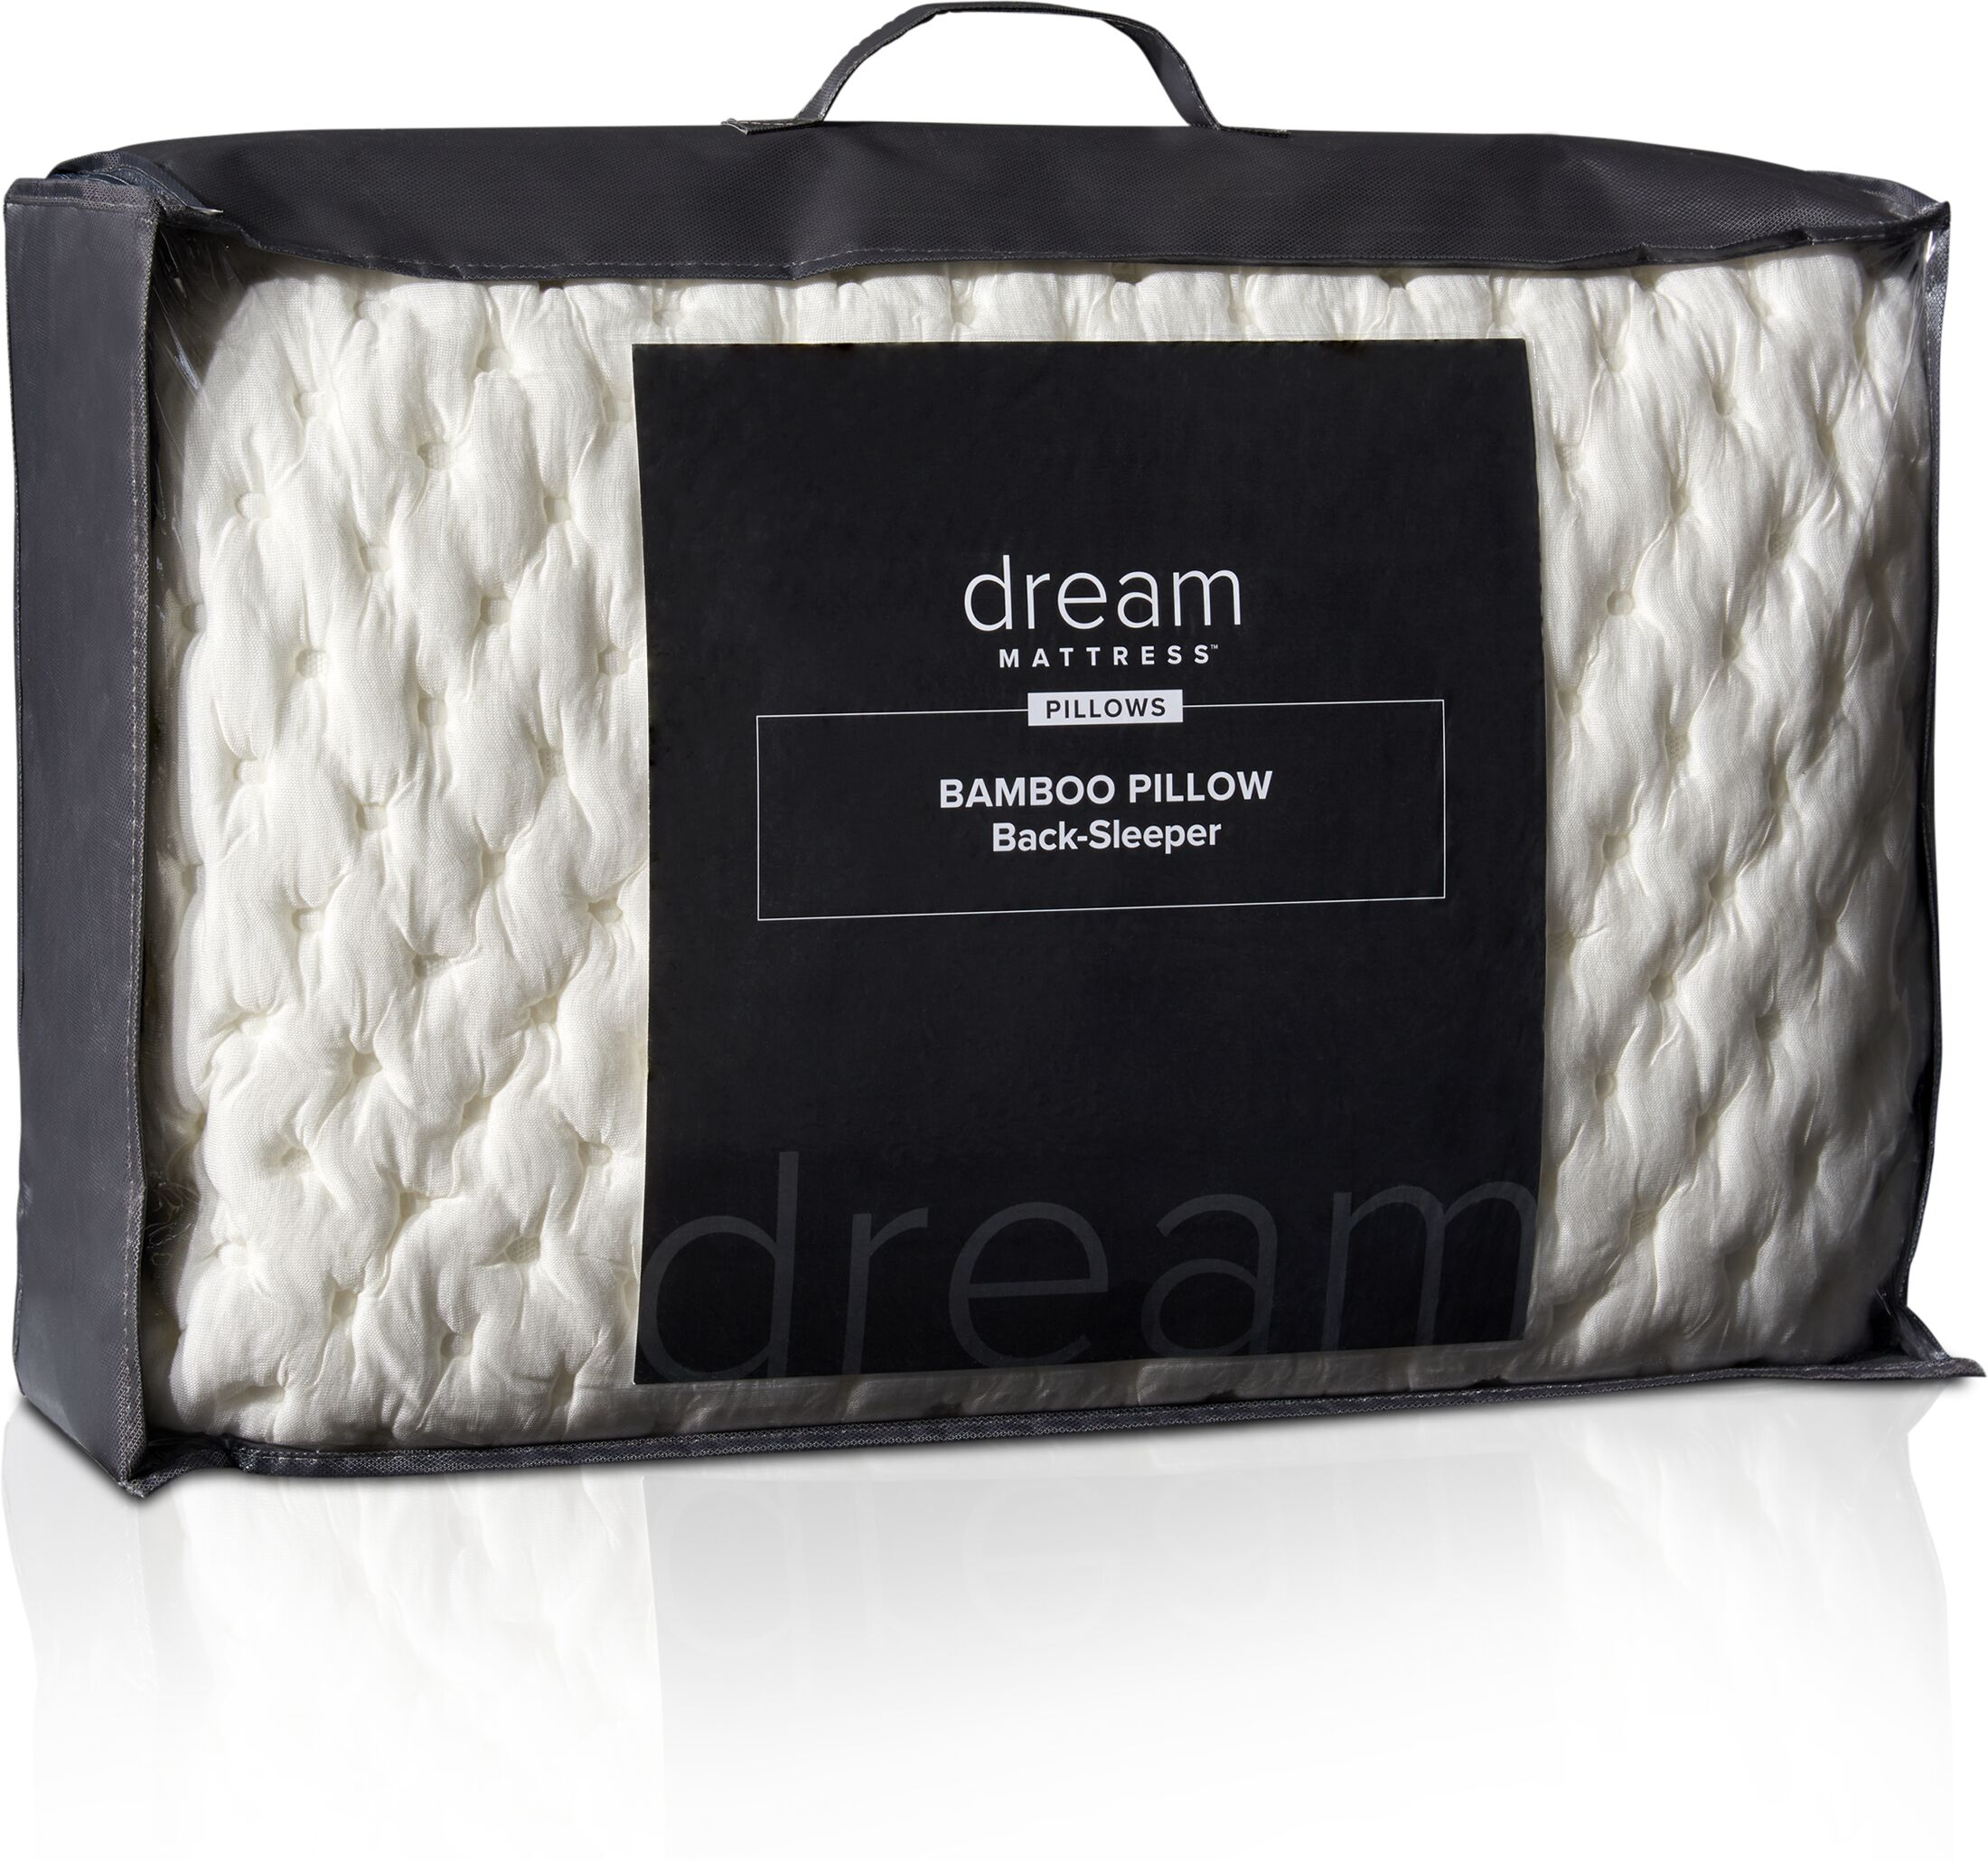 Mattresses and Bedding - Dream Back Sleeper Bamboo Pillow